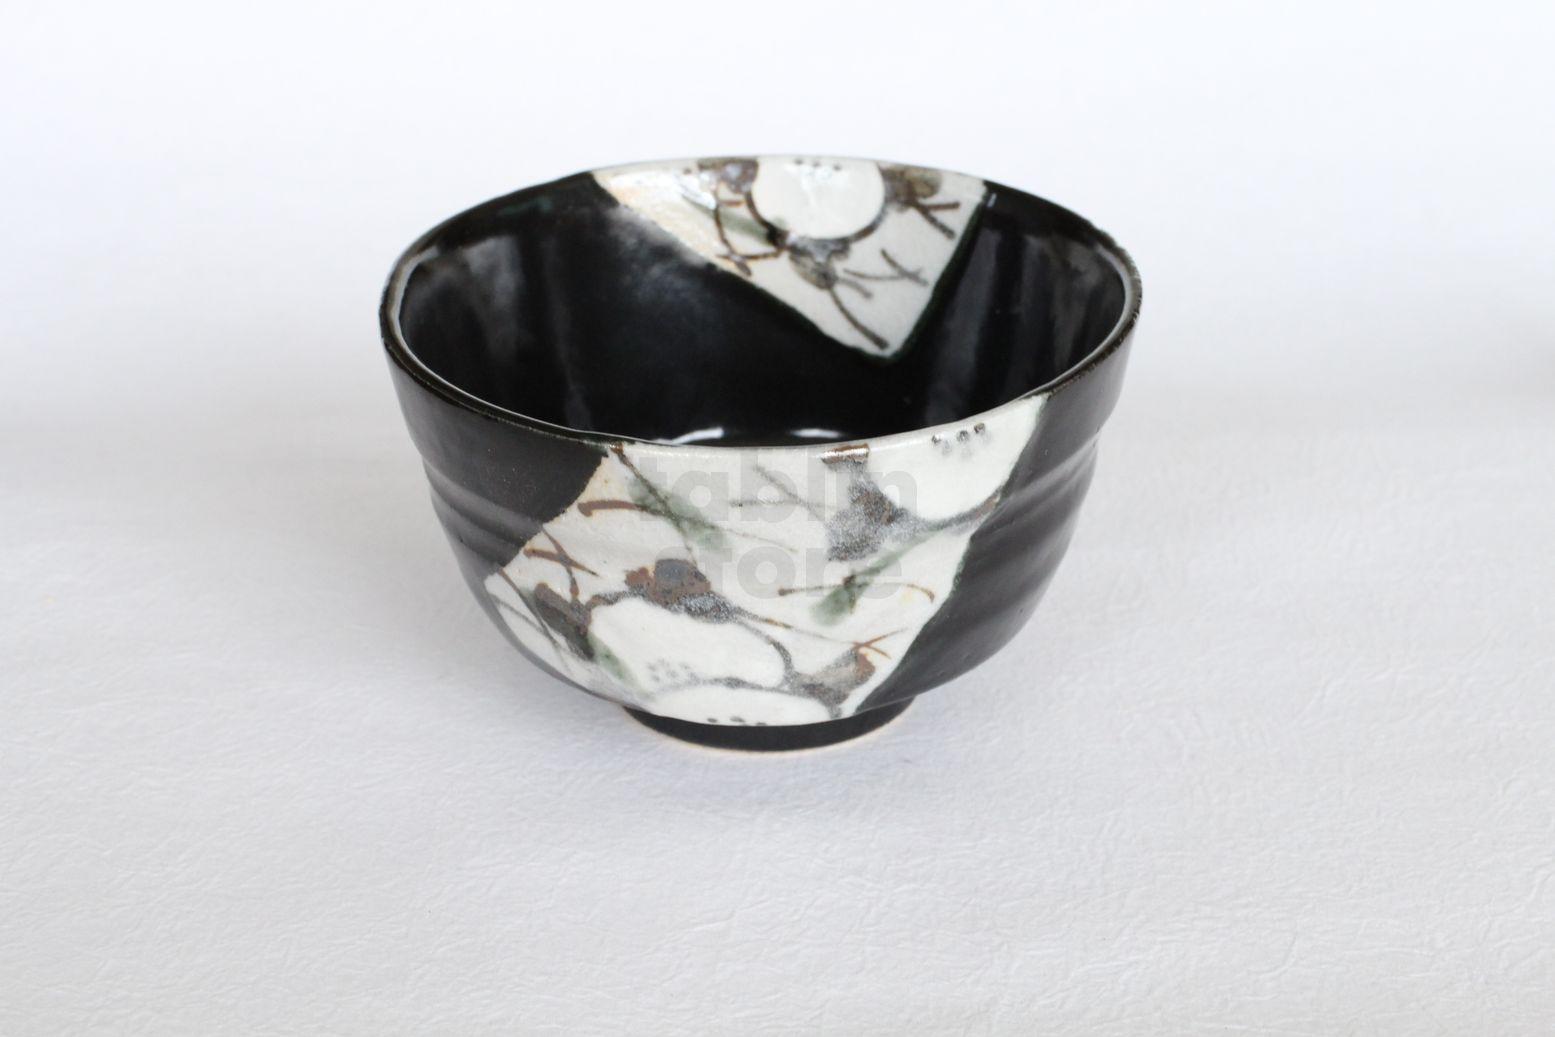 Mino ware Japanese tea ceremony bowl Matcha chawan pottery nishikiyama oribe bl